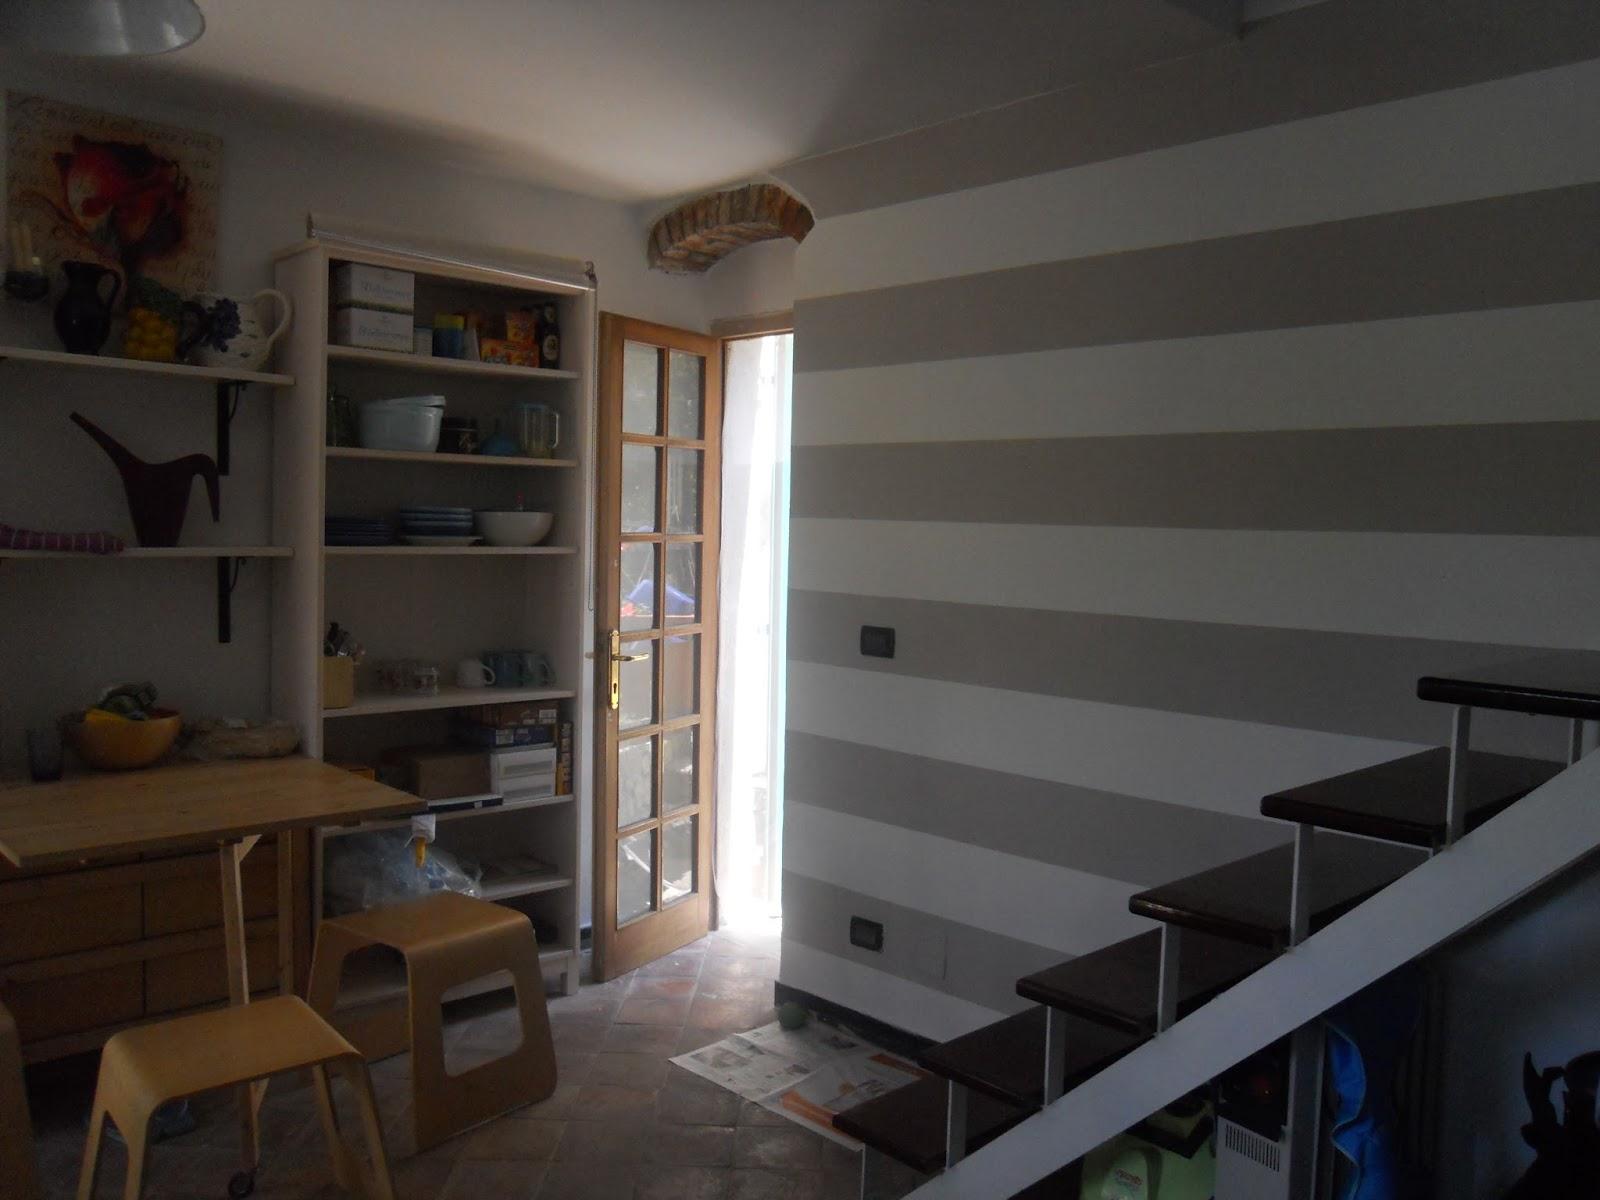 Tavolini ikea cucuna piccoli dpazi - Blog decorazione interni ...